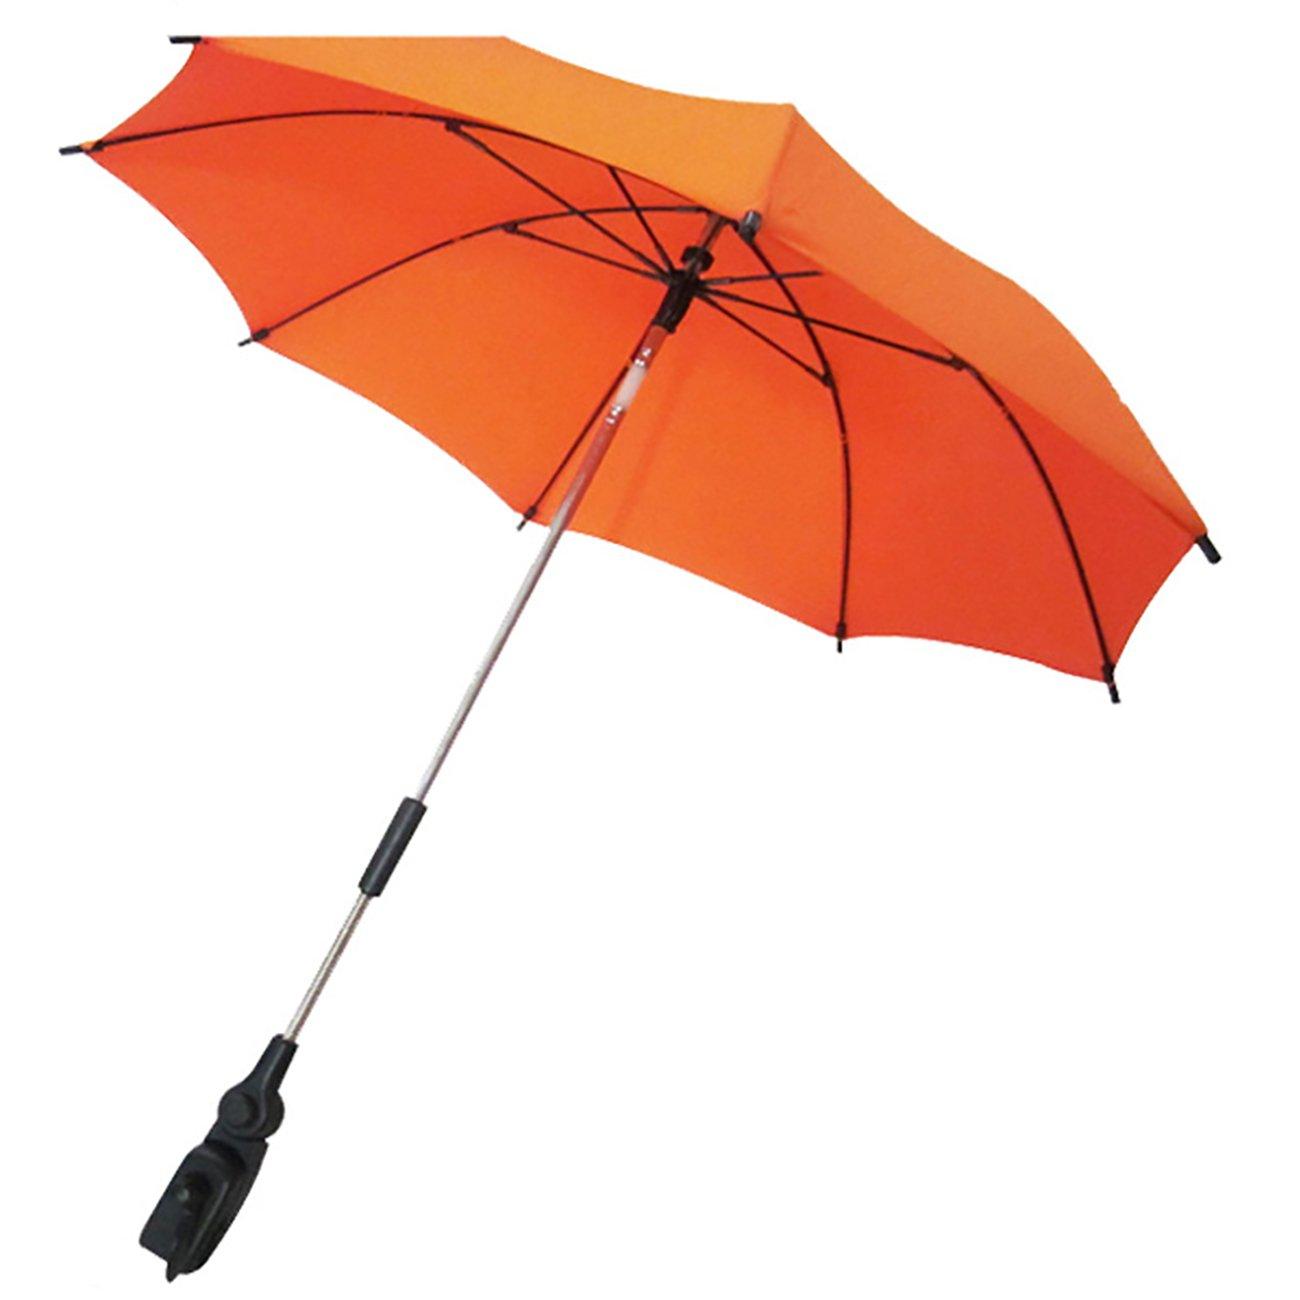 THEE Wheelchair Pushchair Baby Stroller Parasol Rain Sun Canopy Stretchable Pram Stroller Umbrella Holder Clip Clamp